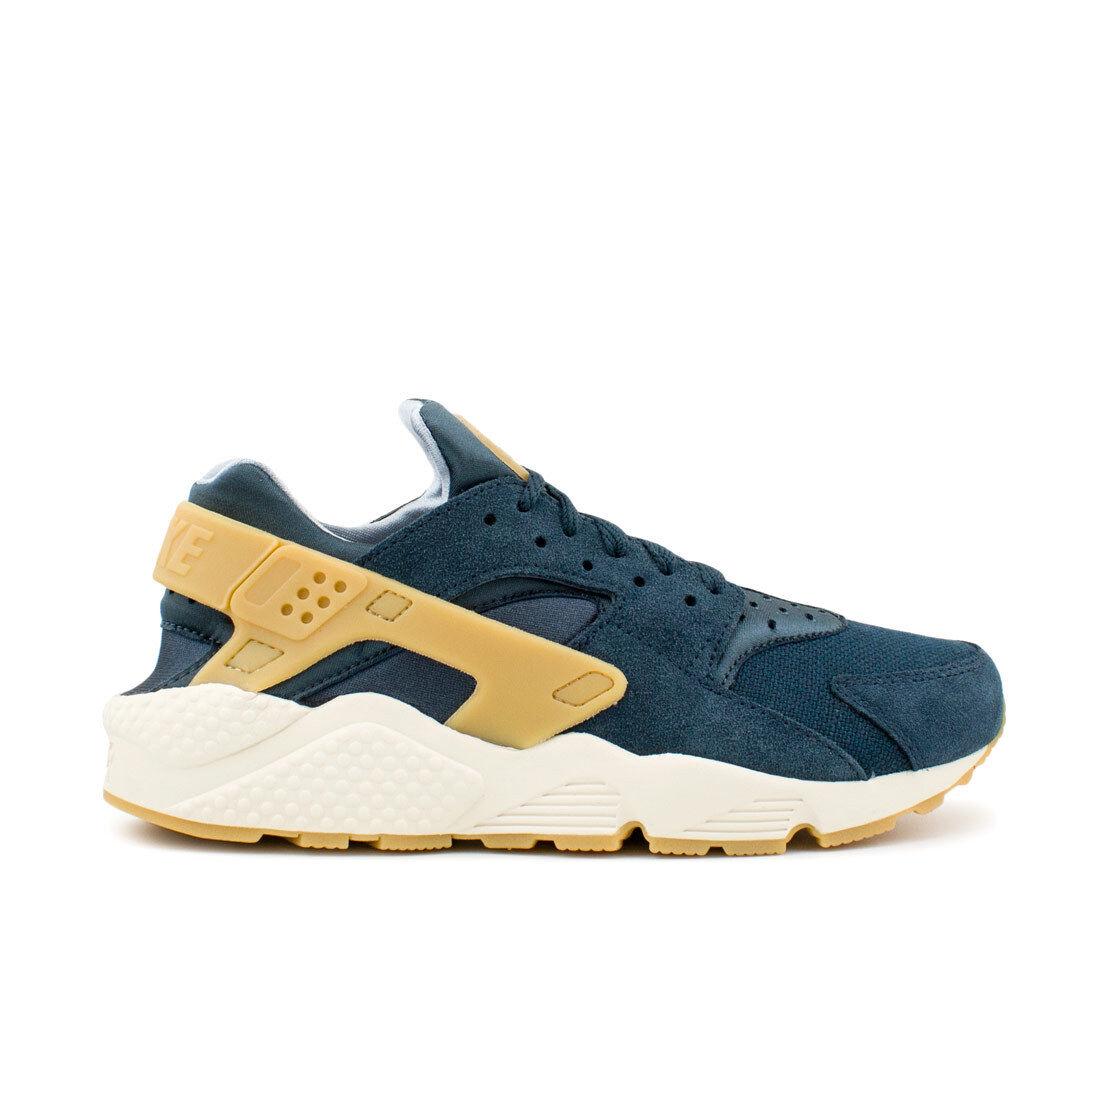 Nike Air huarache Run beige se zapatillas Azul Bianco beige Run 852628 401 3b2d76